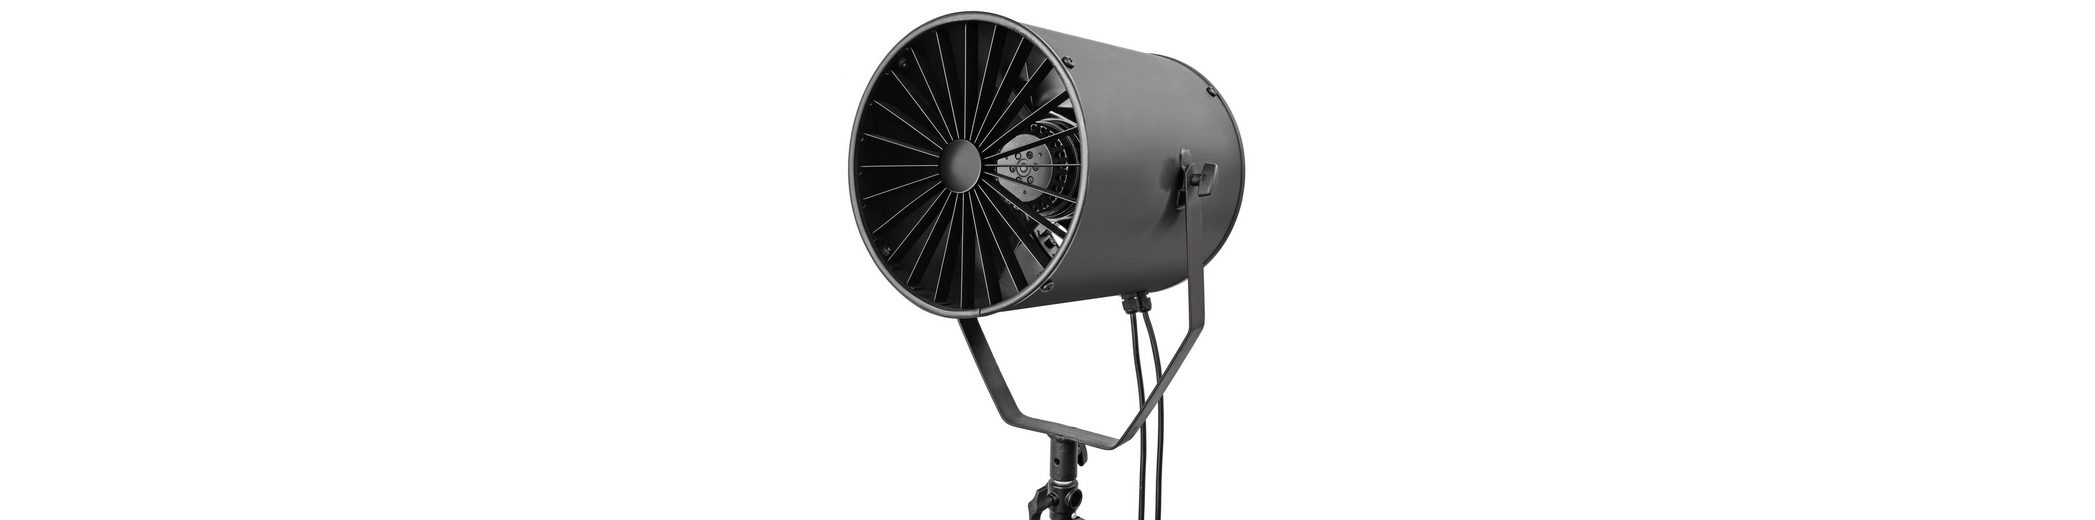 Bresser Fotostudio »BRESSER FS-01 Professional Windmaschine 2600 U/M«